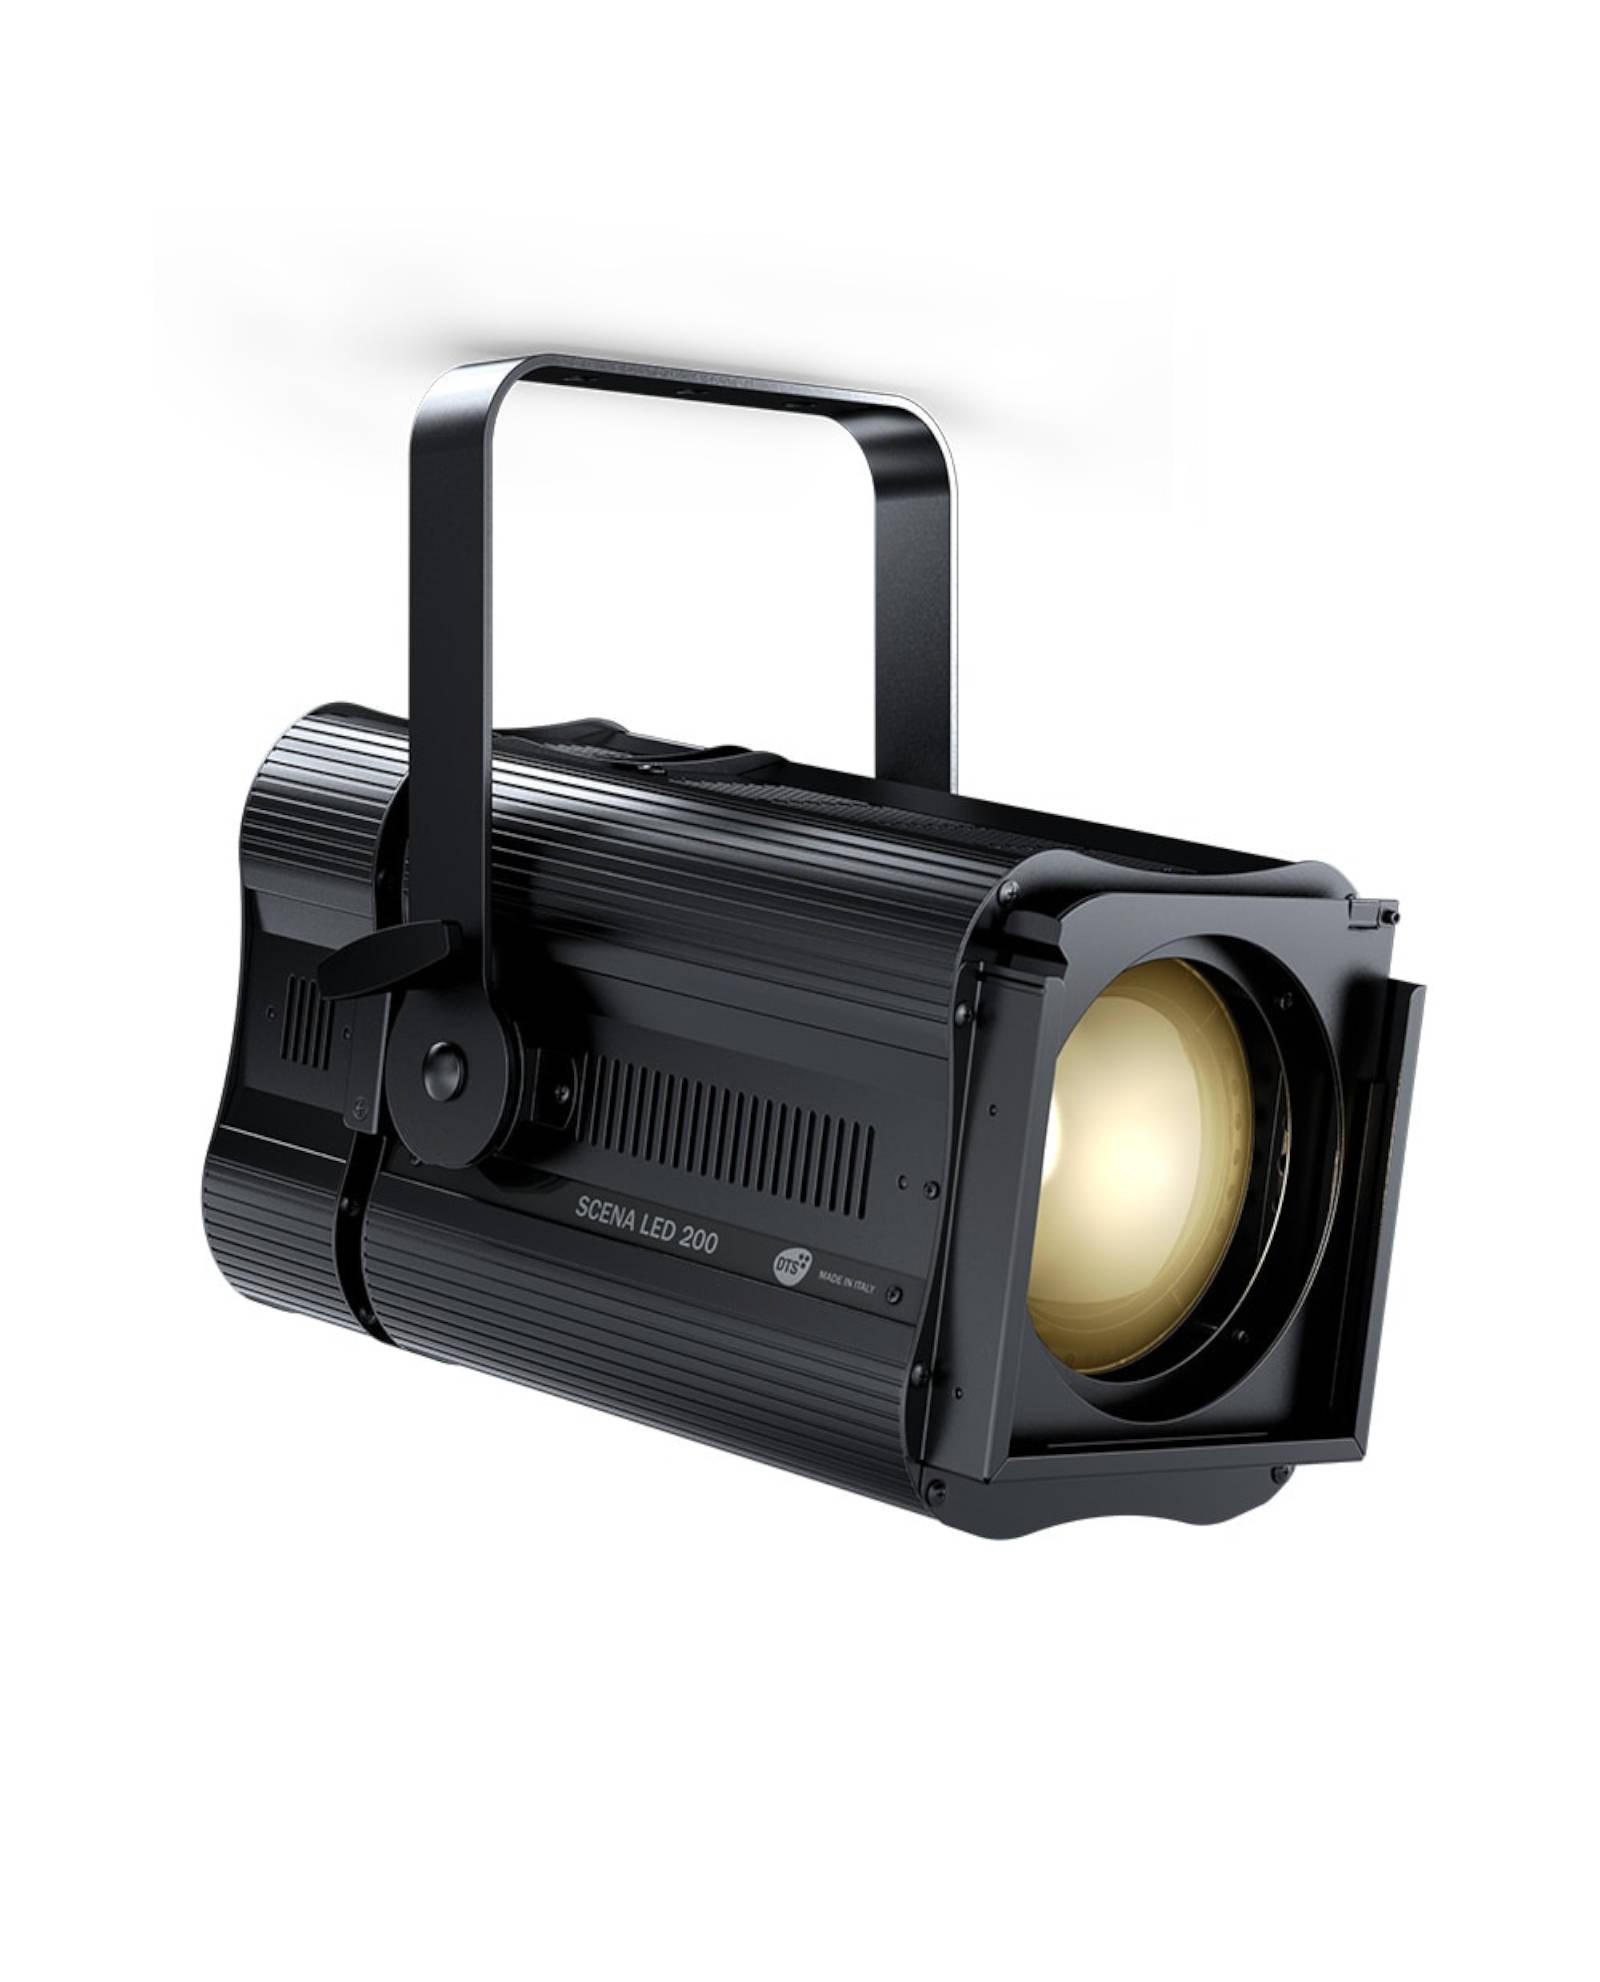 Dts Lighting Scena Led 200 4